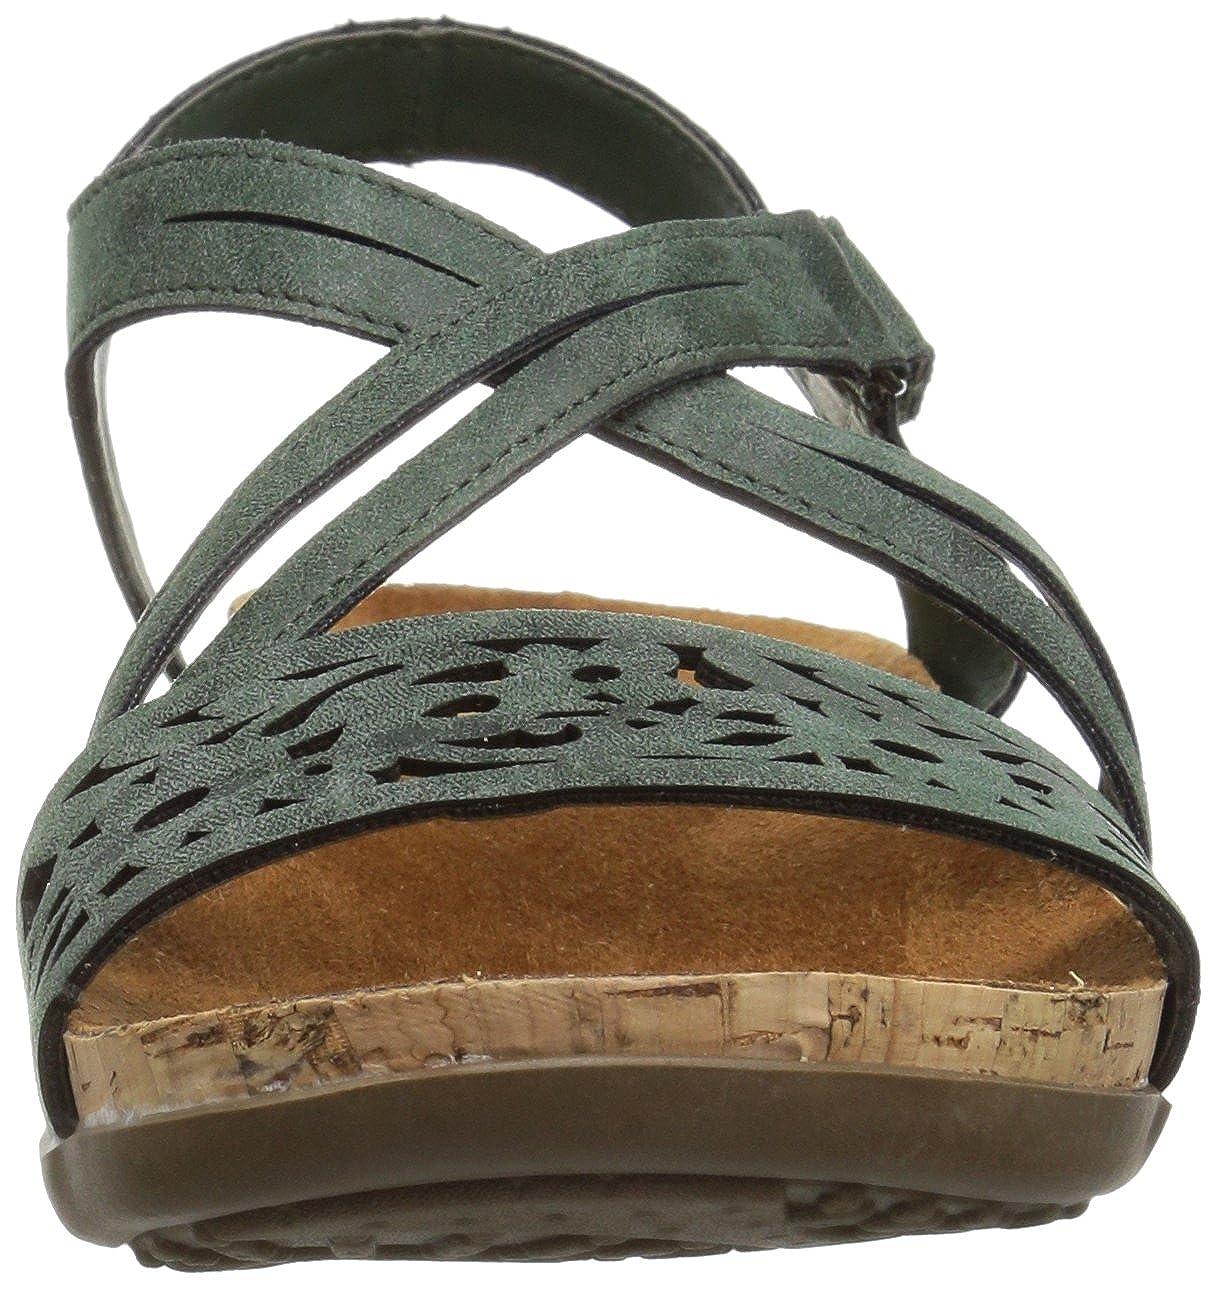 BEARPAW Damens's Glenda Heeled Sandale, US Marsh, 7 M US Sandale,  - 389f1a